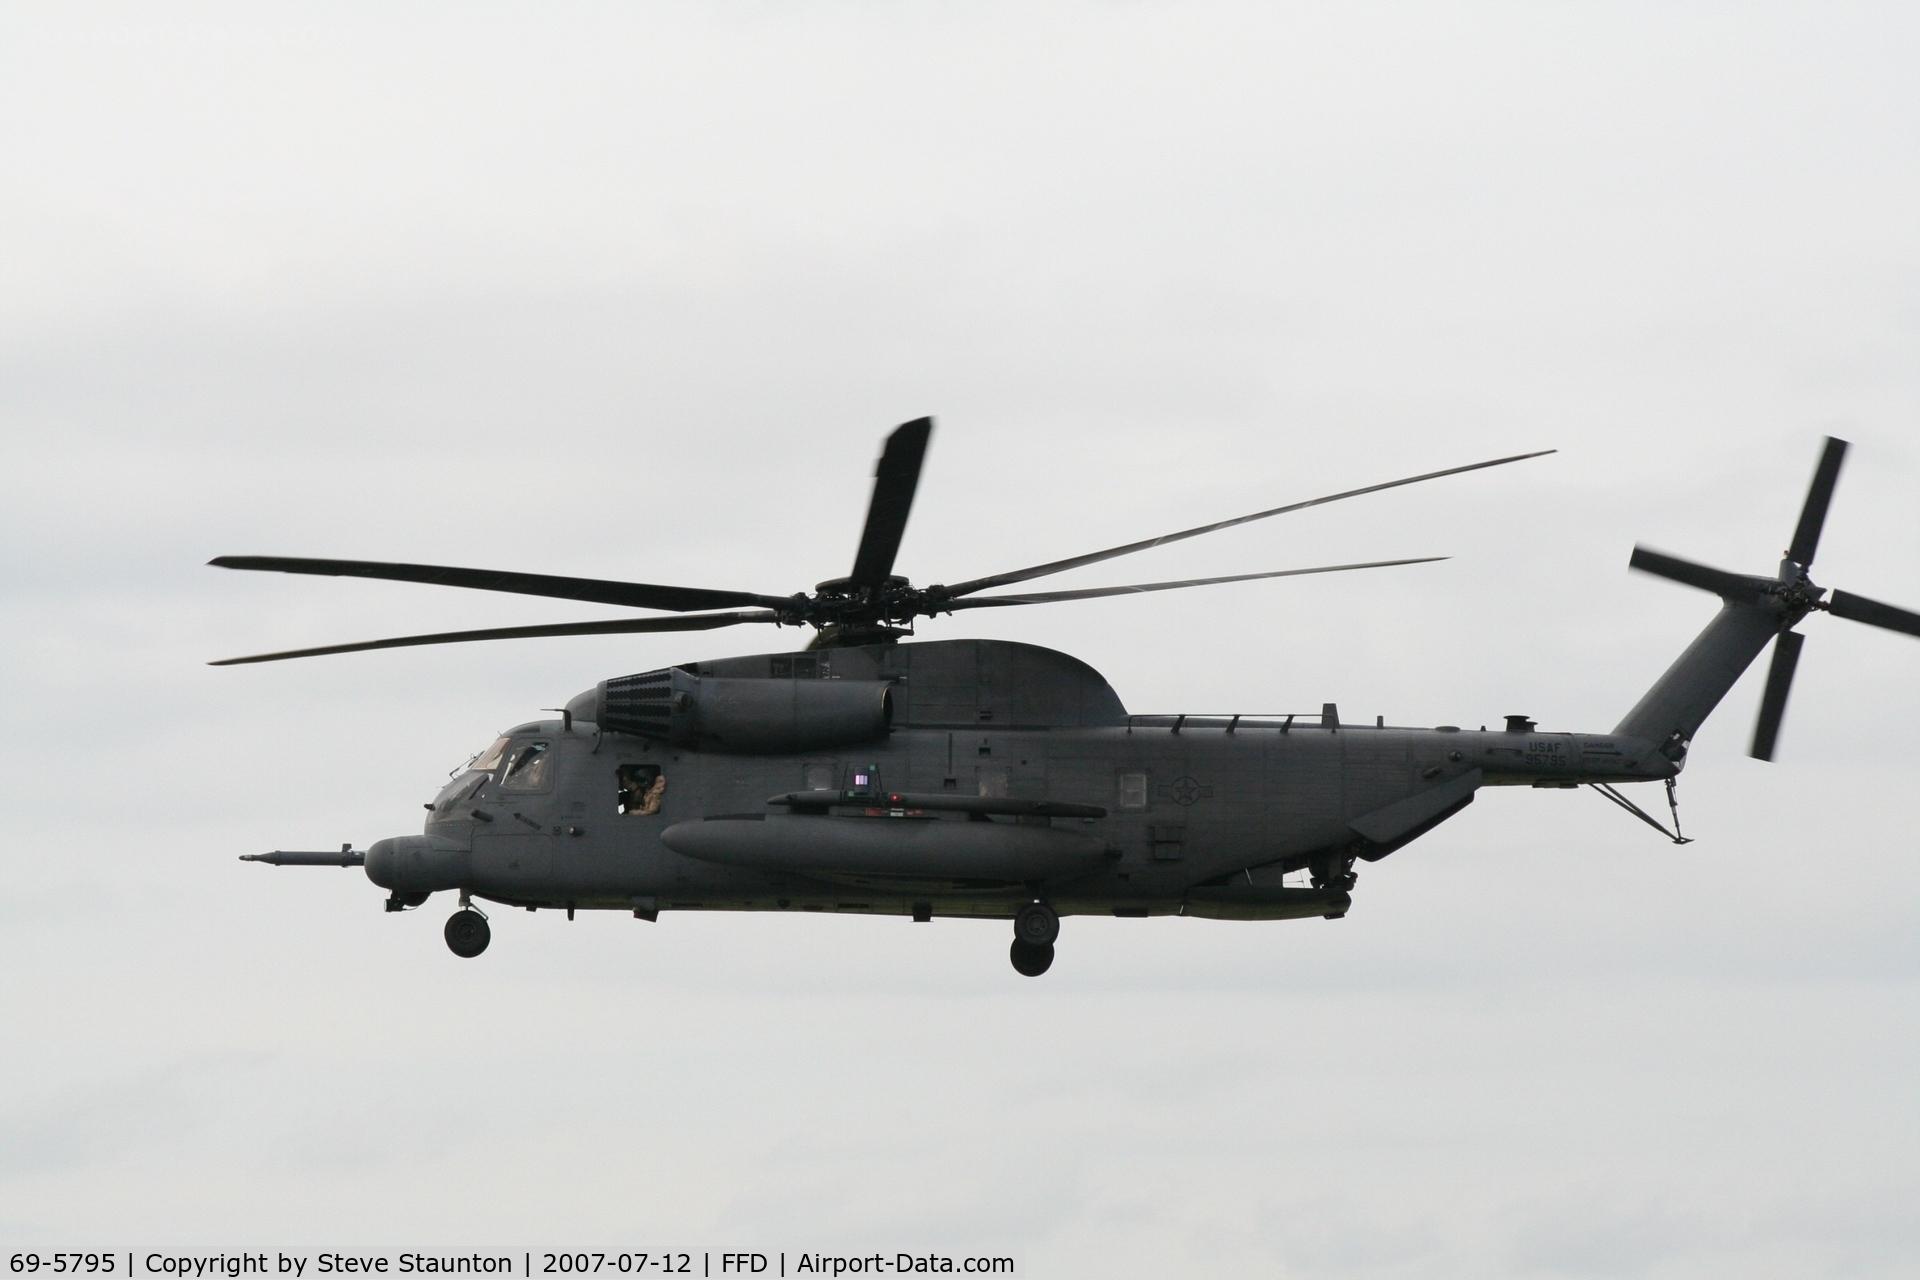 69-5795, 1969 Sikorsky MH-53M Pave Low IV C/N 65-250, Royal International Air Tattoo 2007